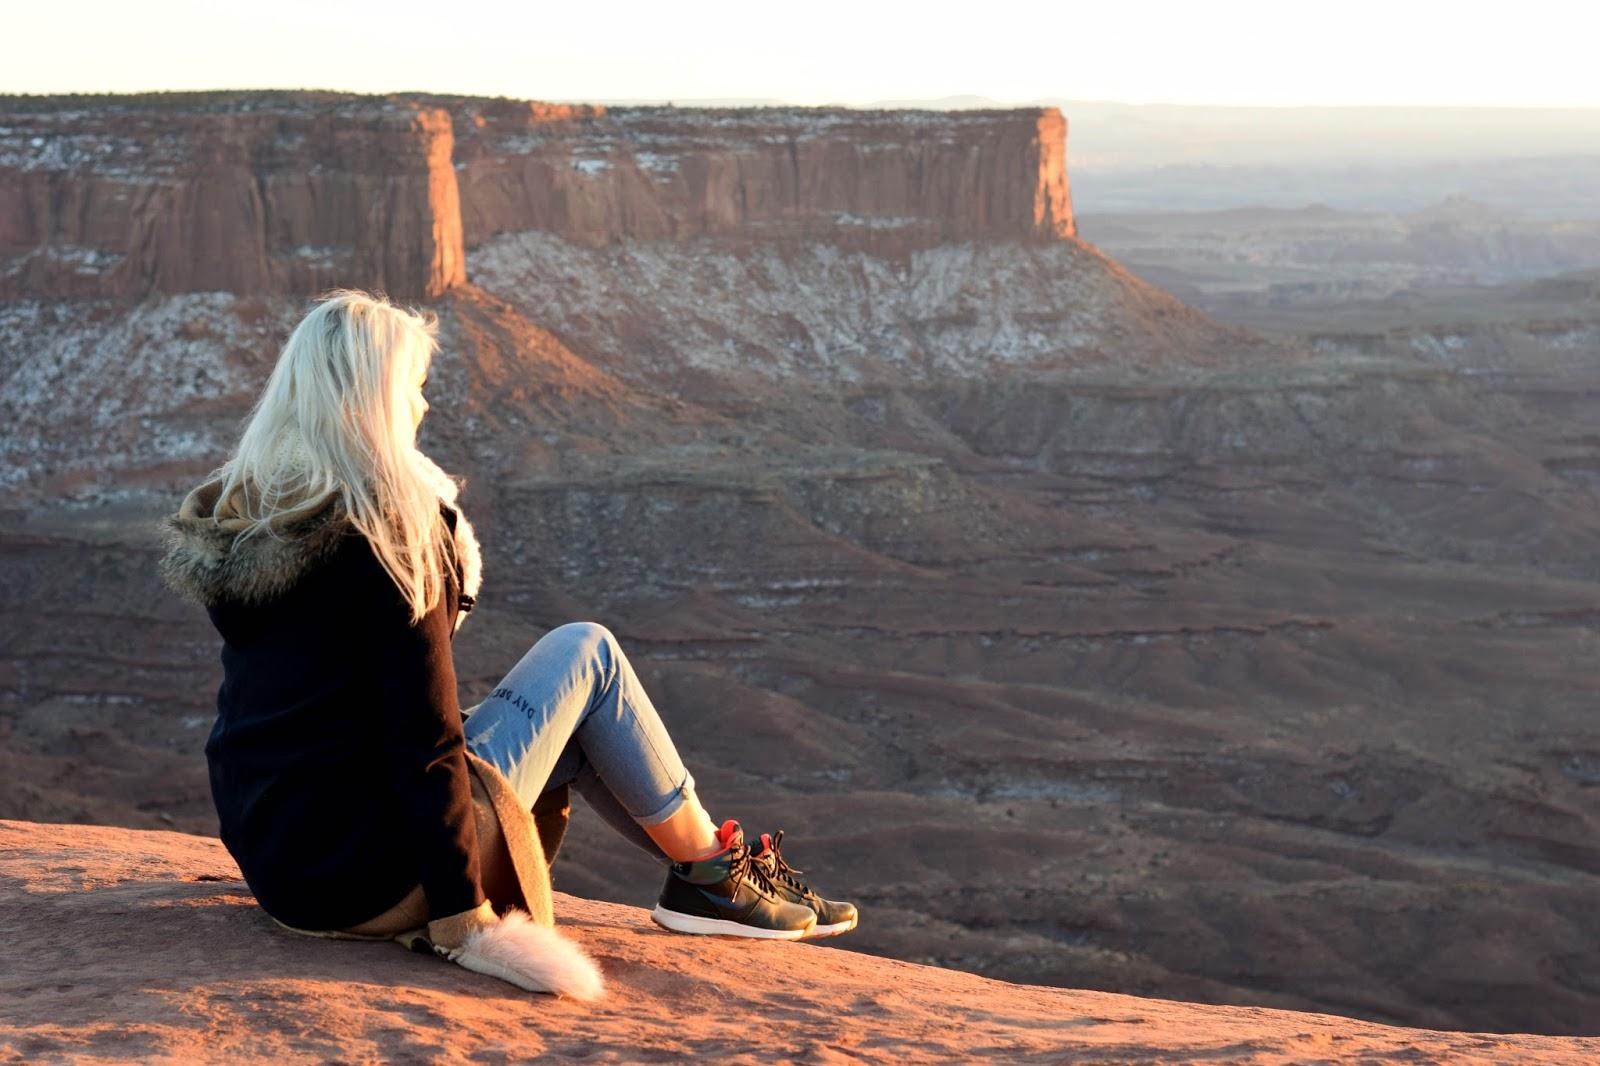 canyonland, utah, national park, hike, german blondy